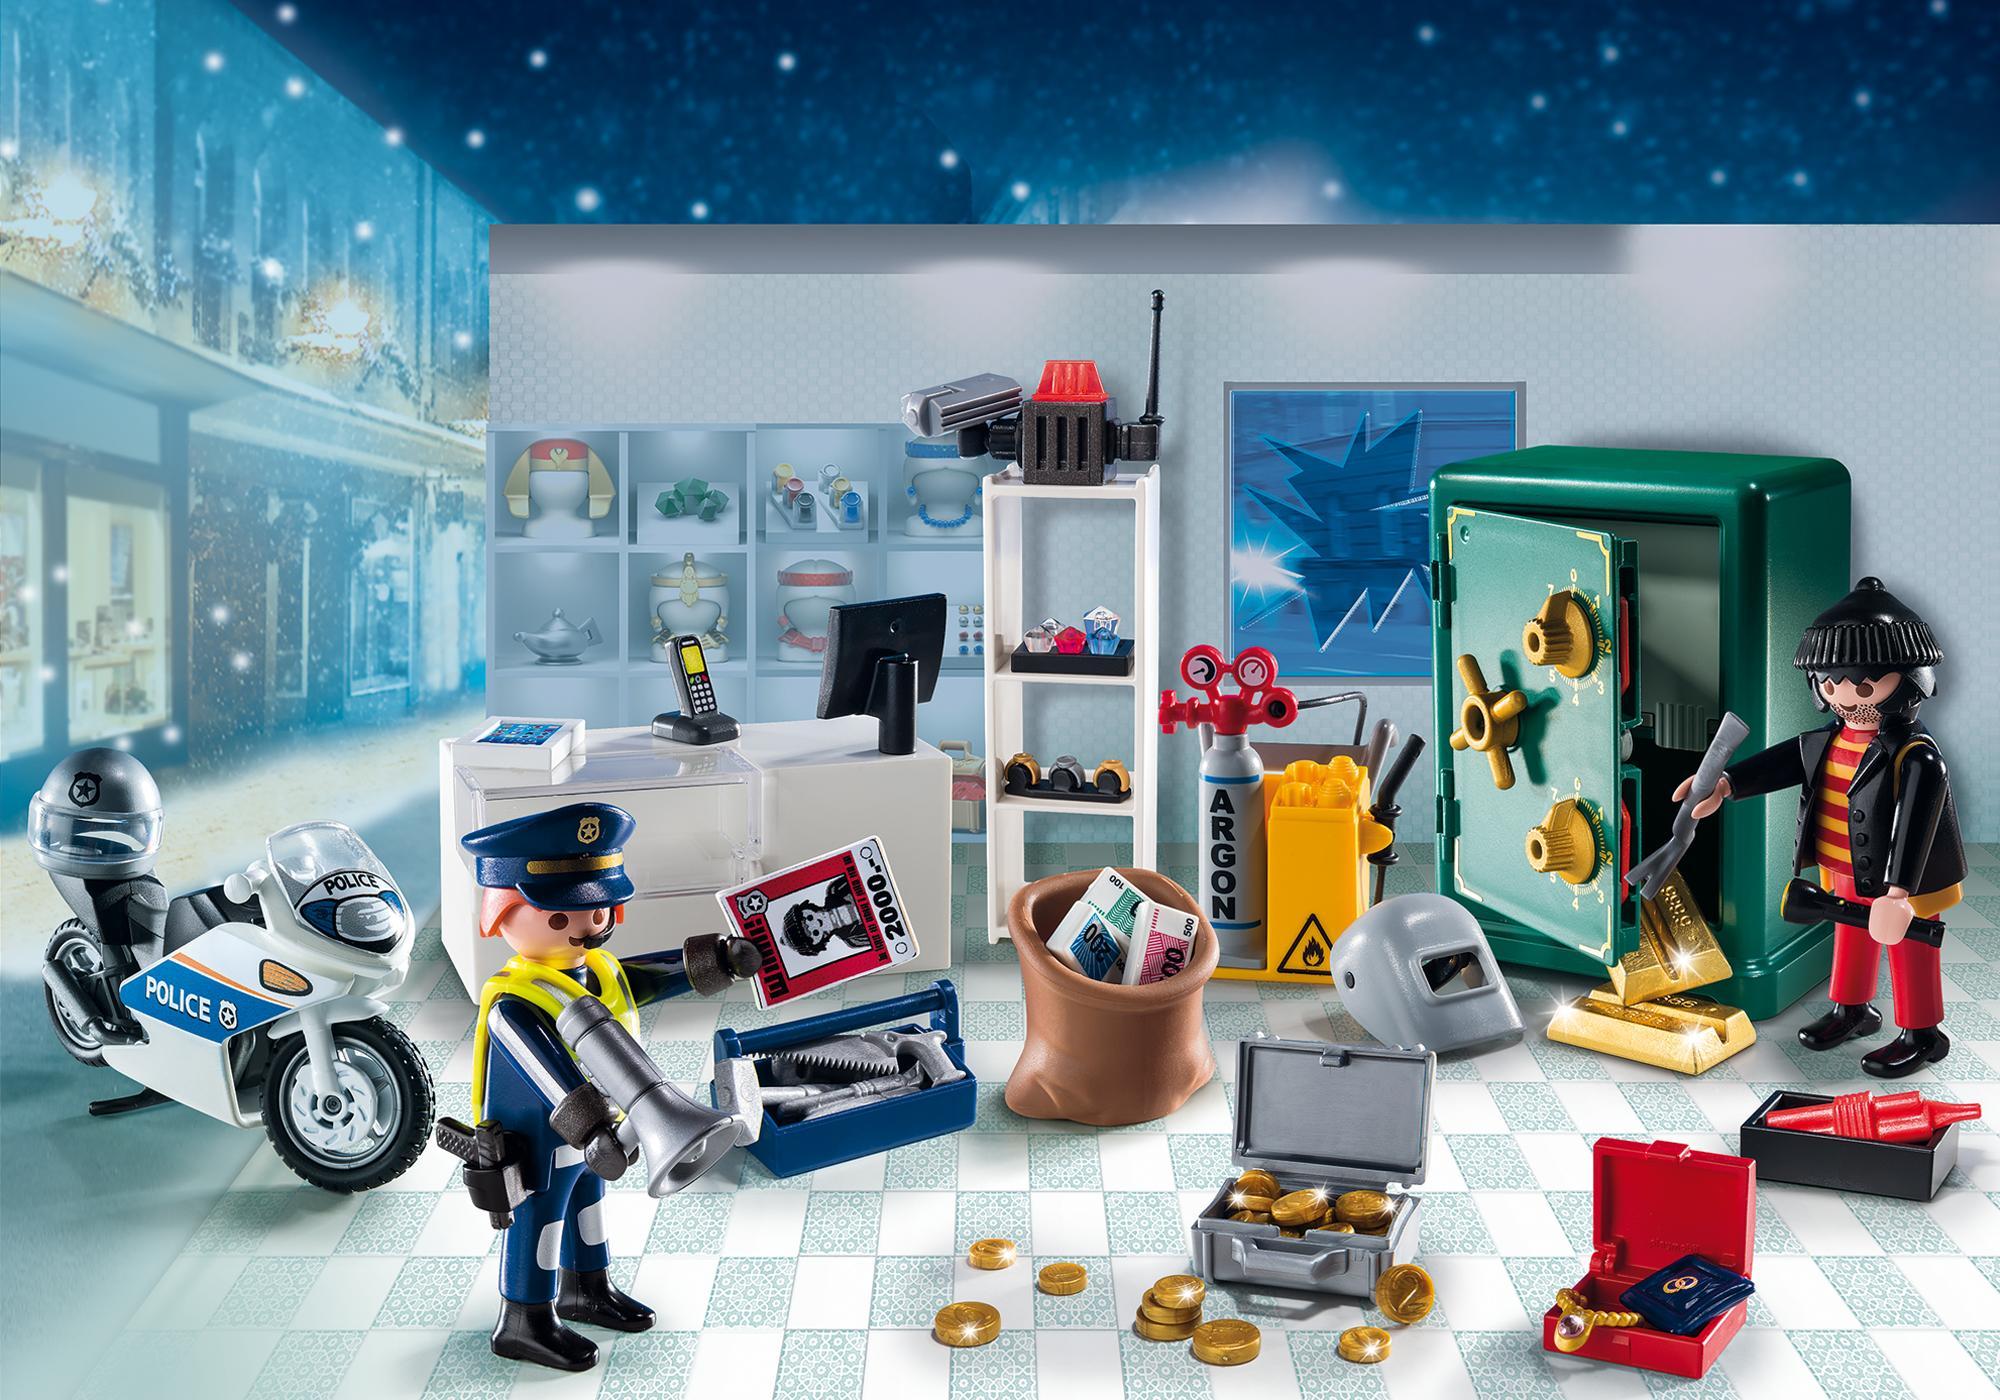 http://media.playmobil.com/i/playmobil/9007_product_extra1/Advent Calender Jewel Thief Police Operation